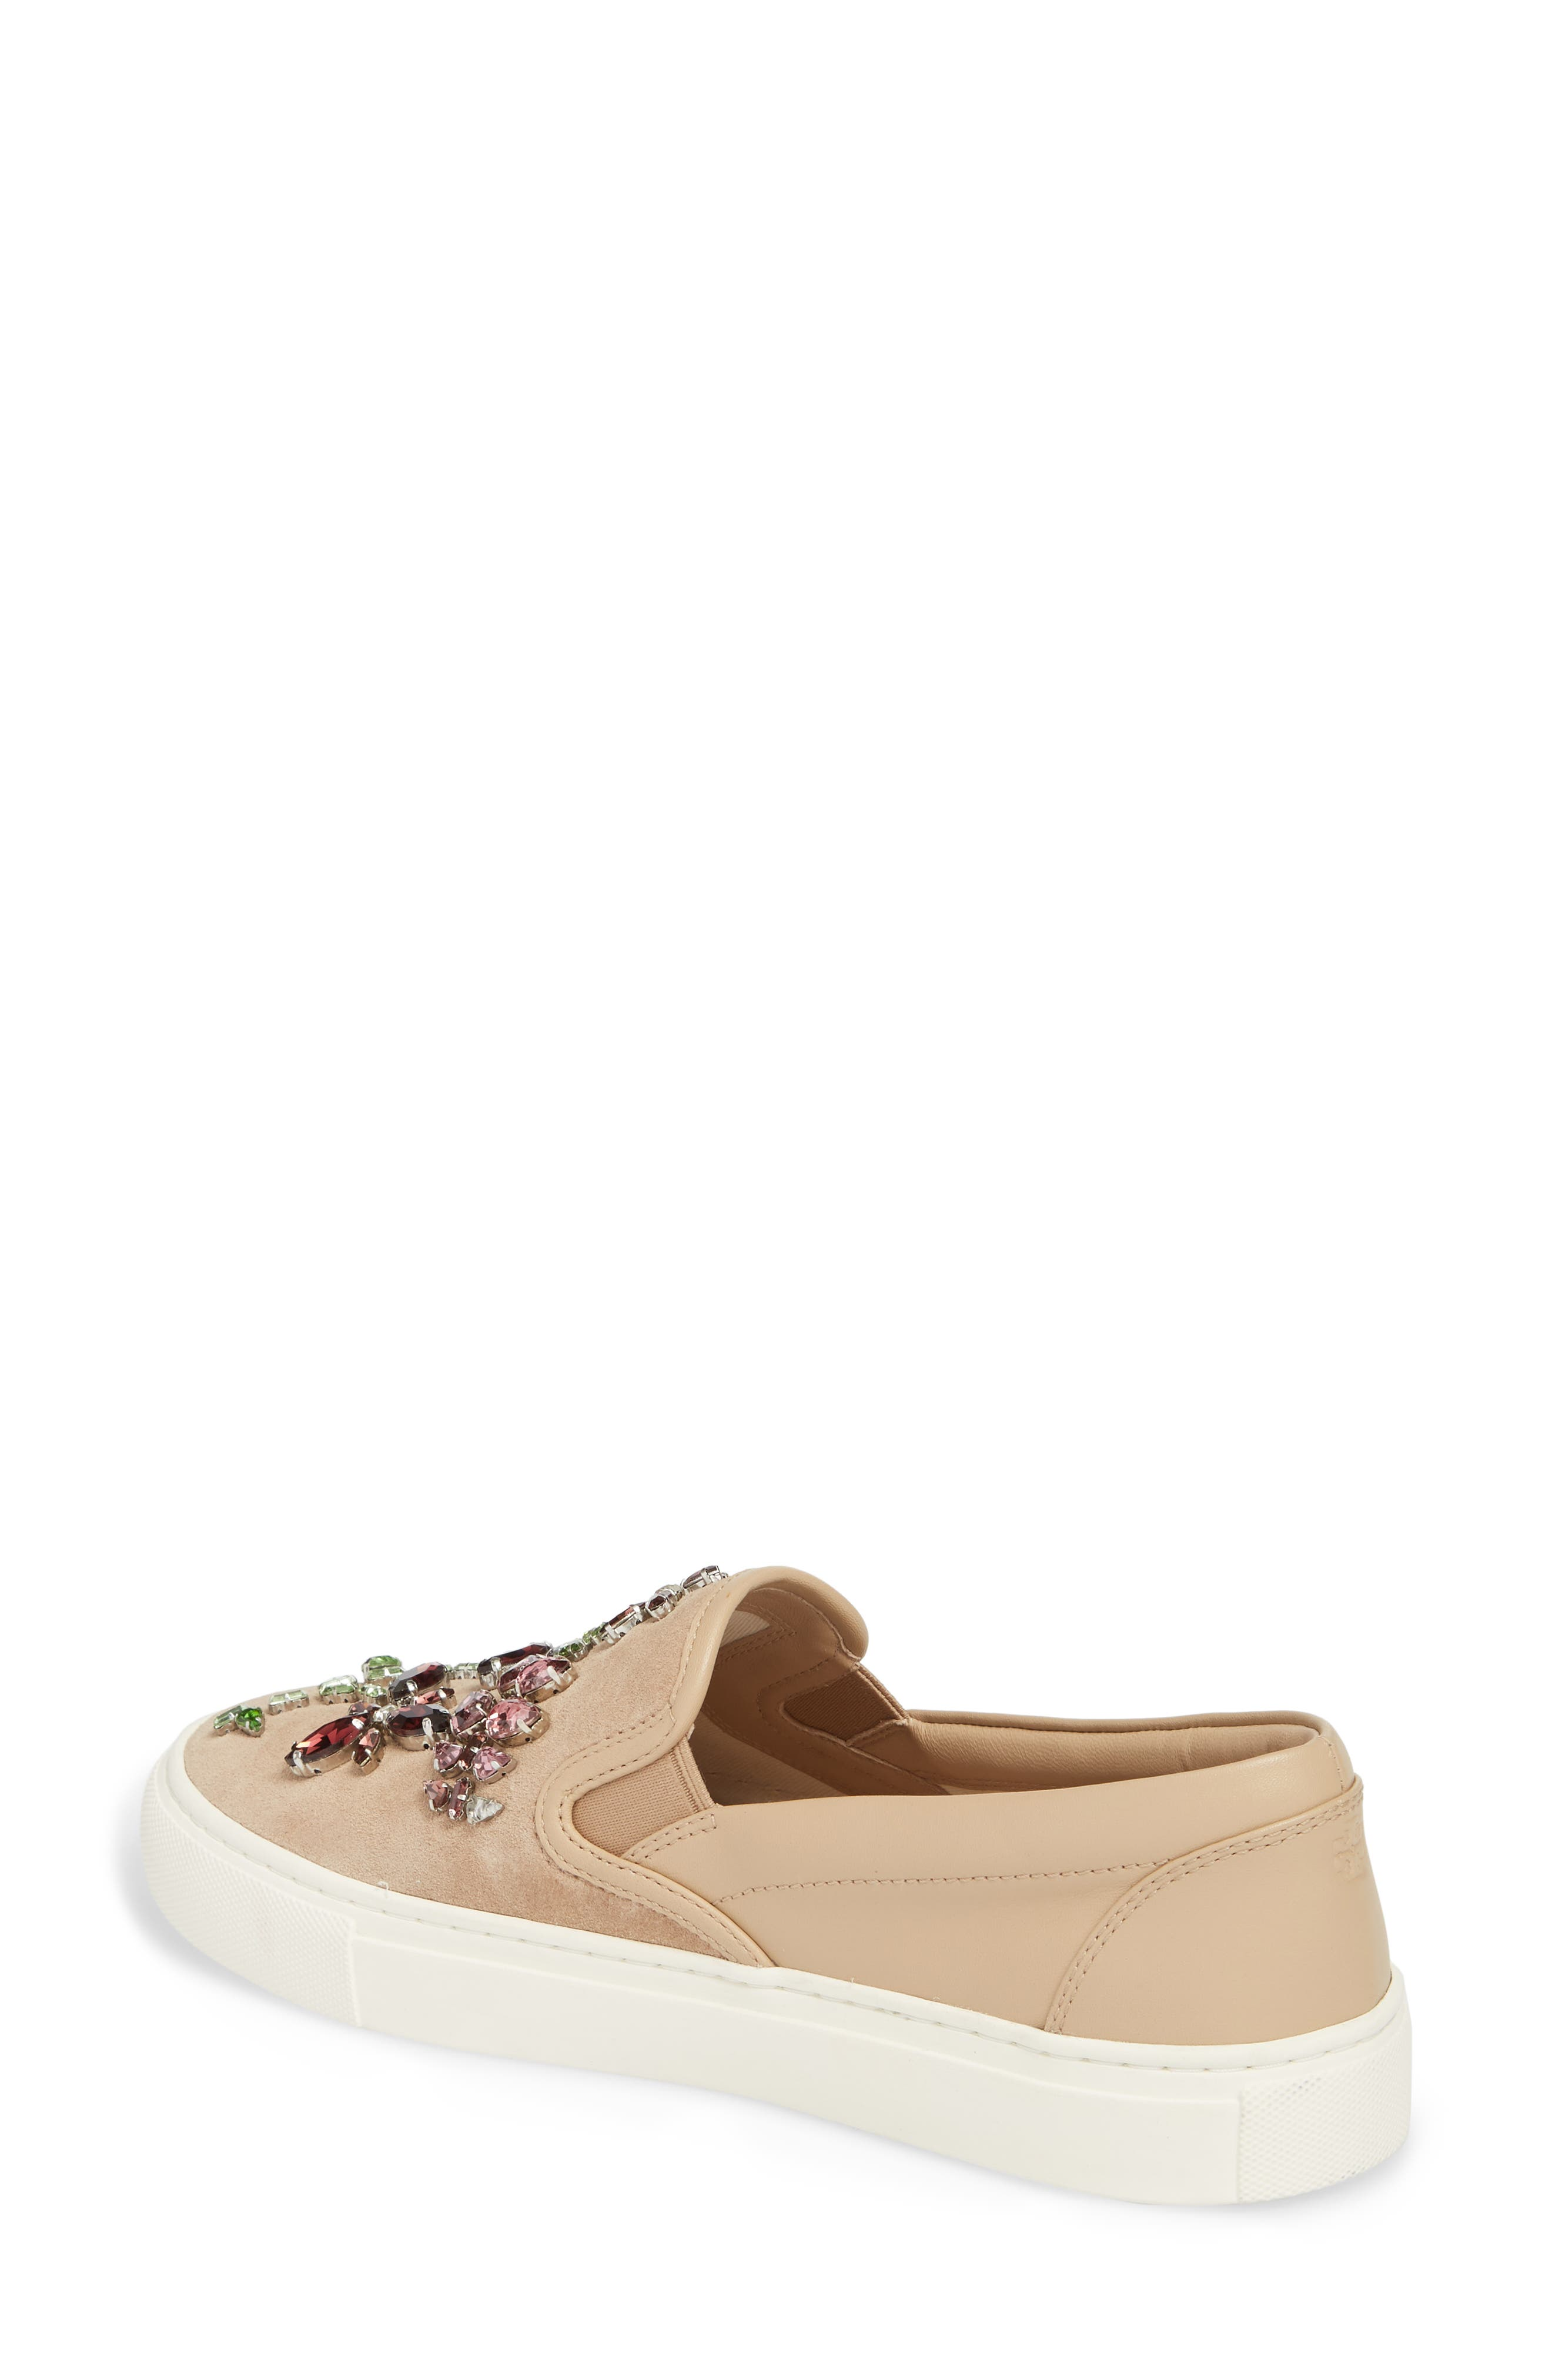 Meadow Embellished Slip-On Sneaker,                             Alternate thumbnail 2, color,                             254